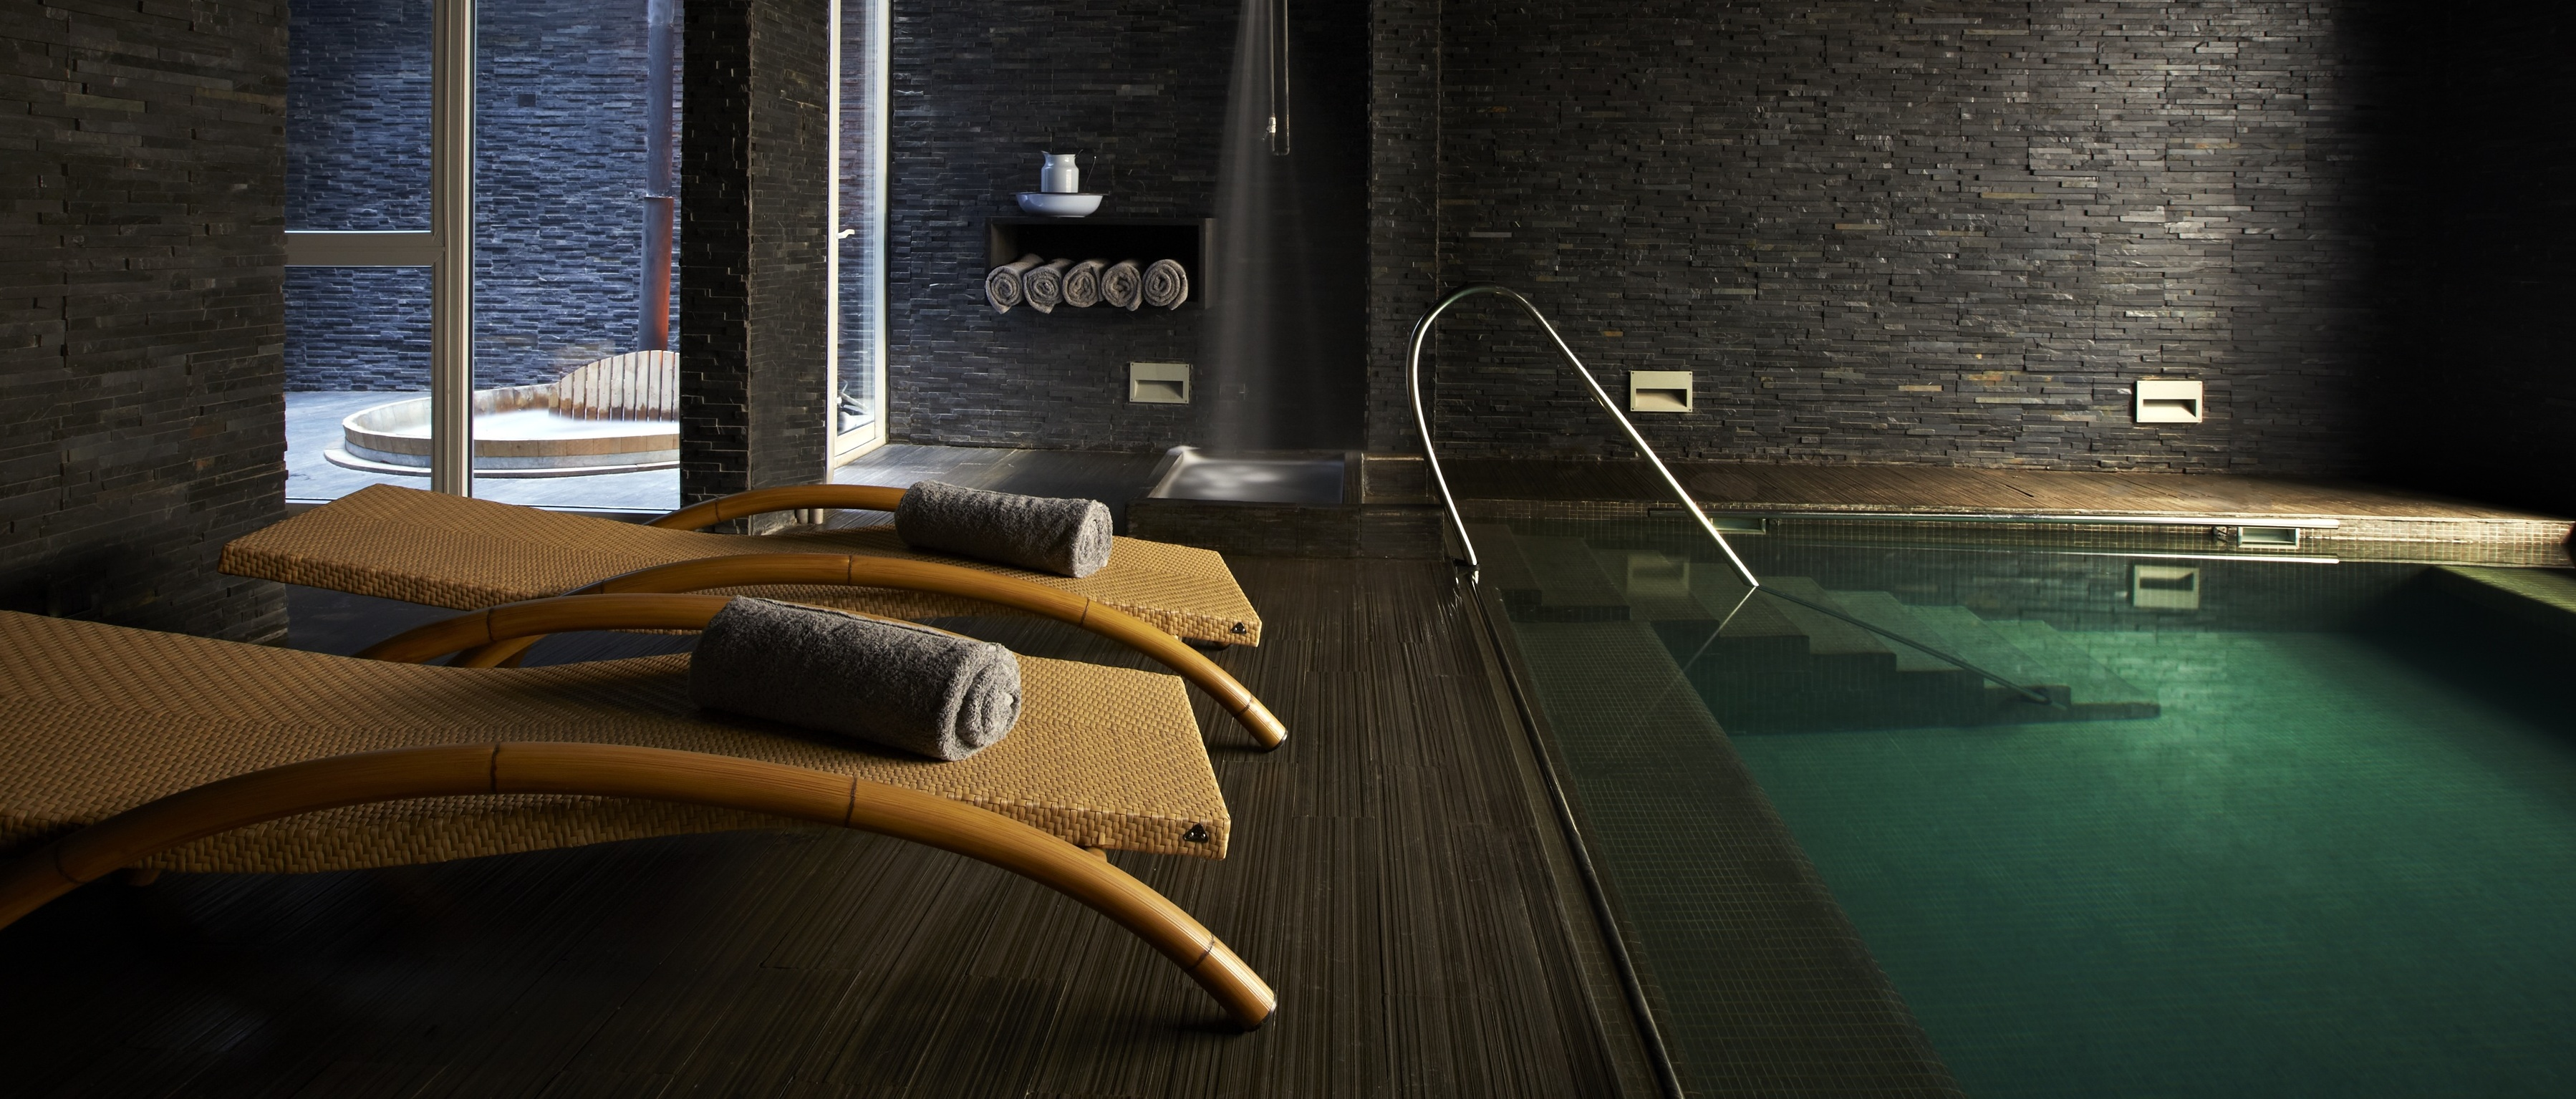 hotel-palacio-valparaiso-spa-pool